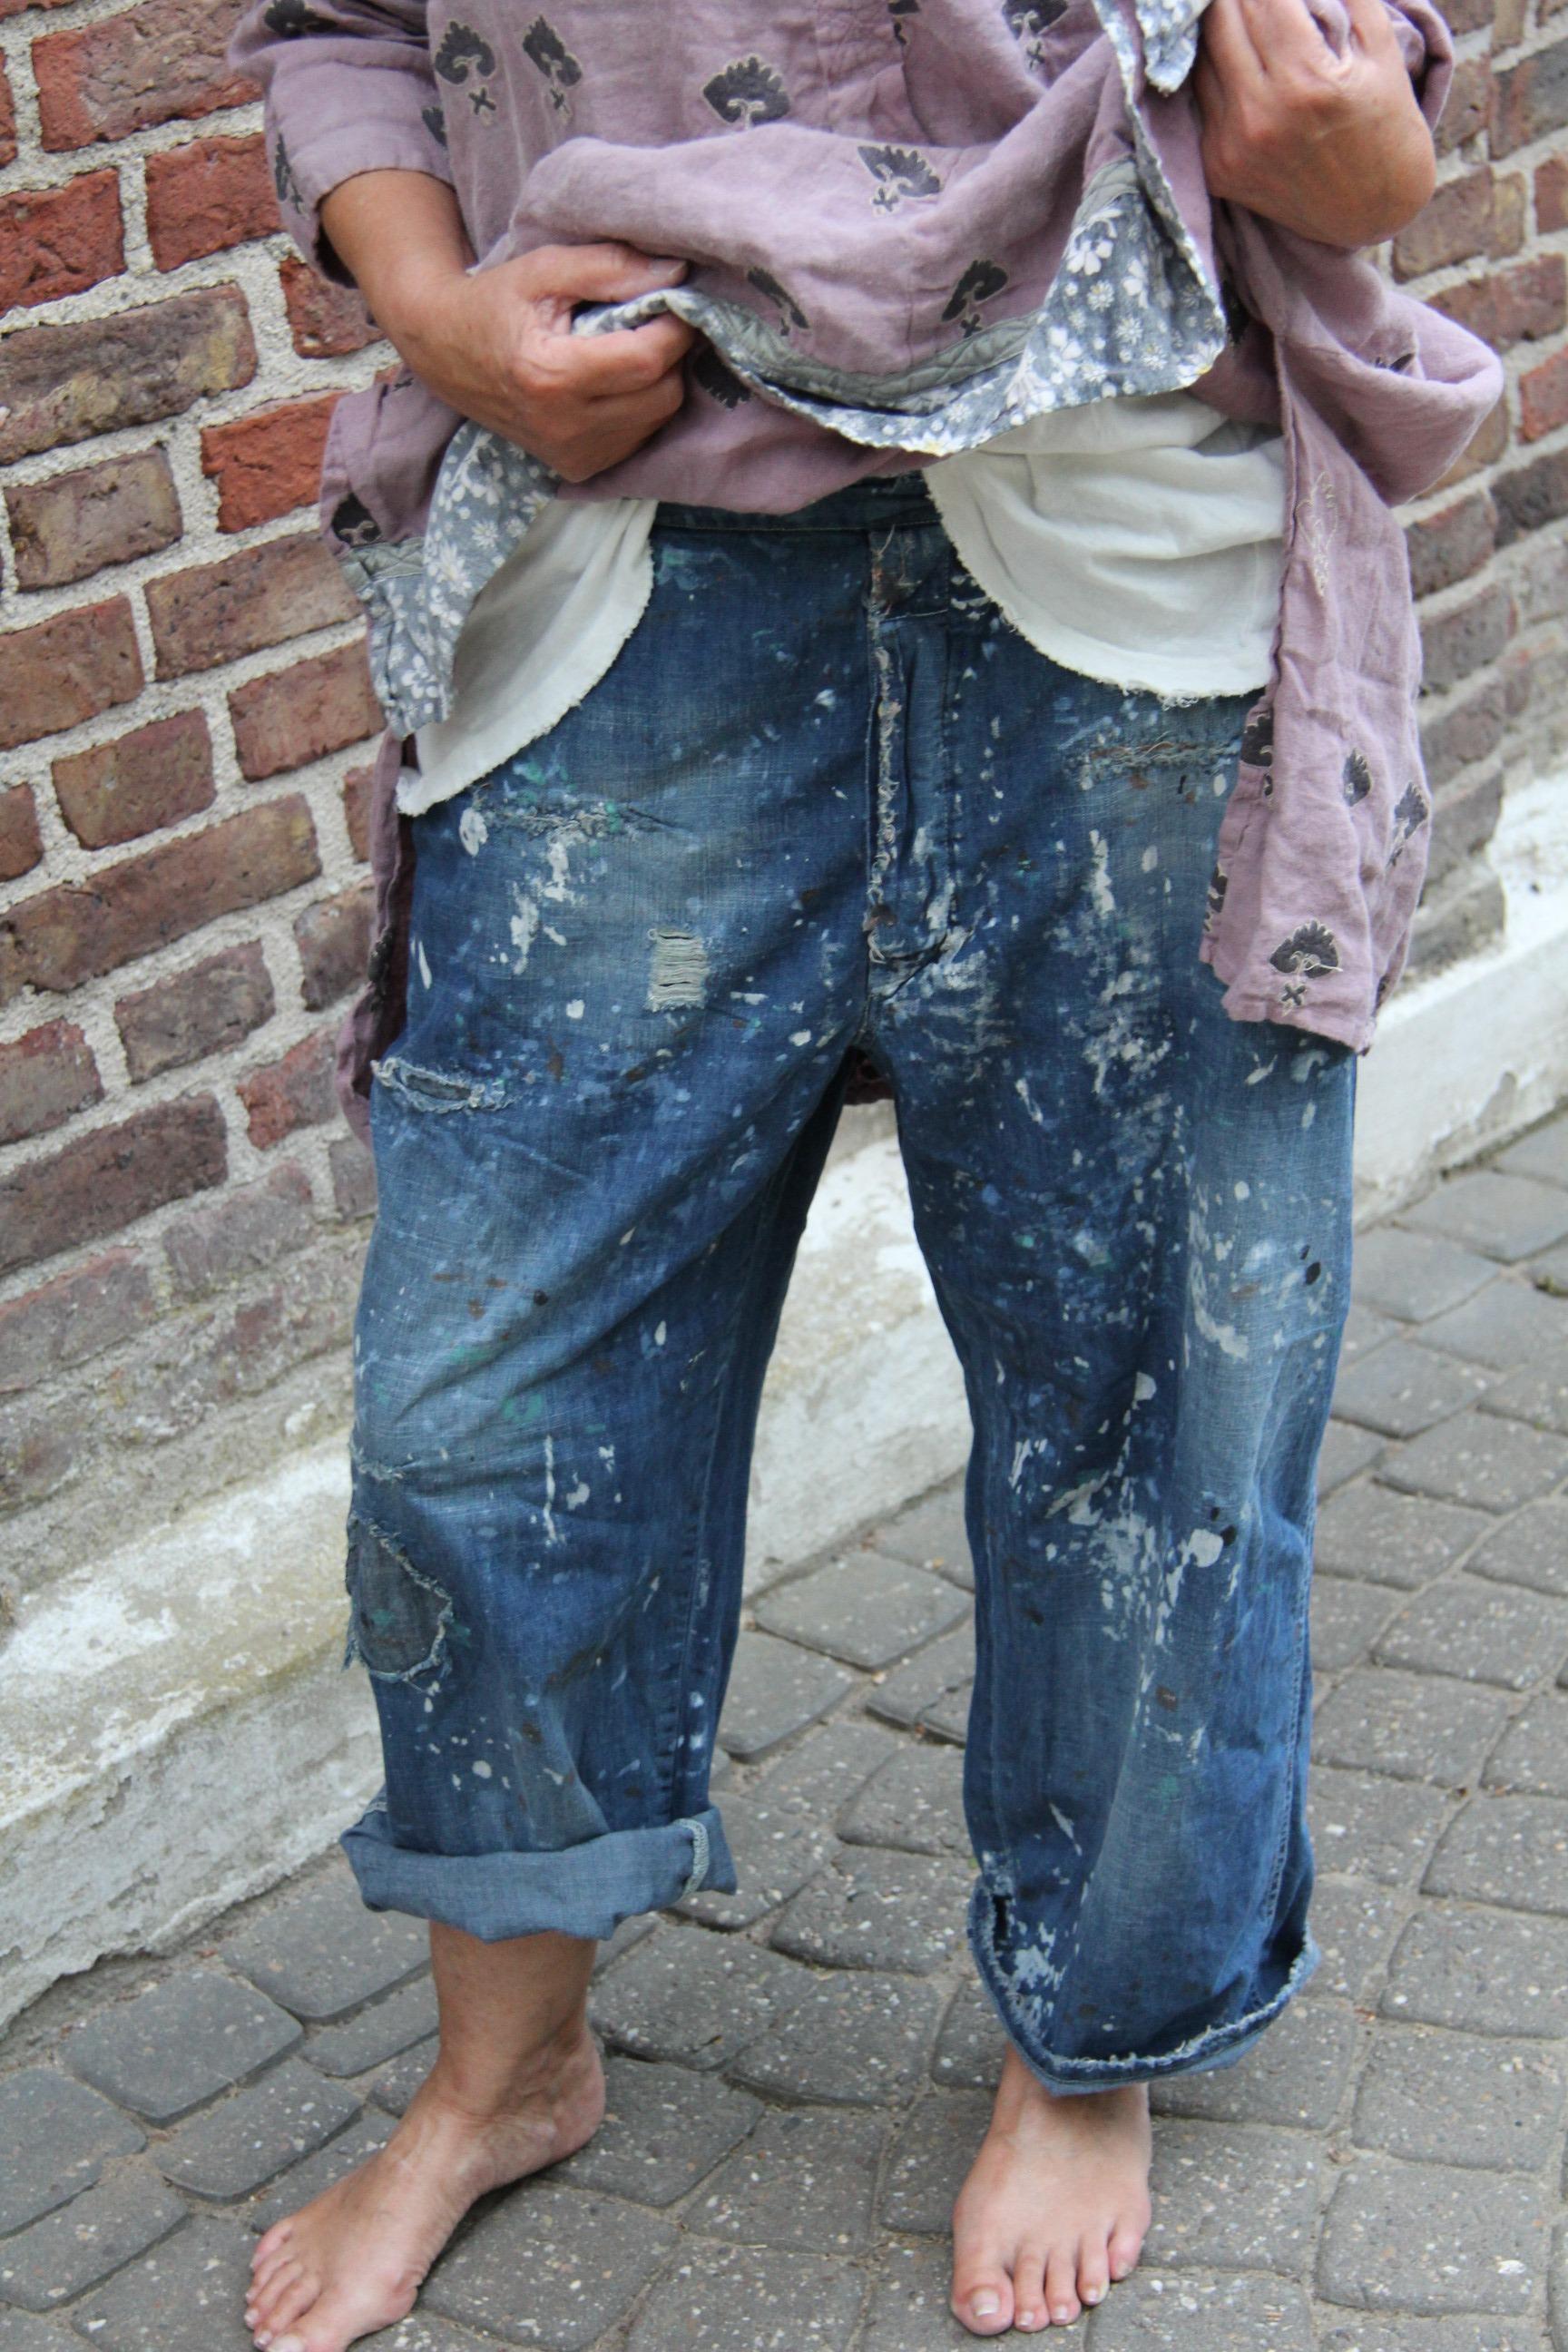 Magnolia Pearl Jeans sanforized Denims Art Class -one size